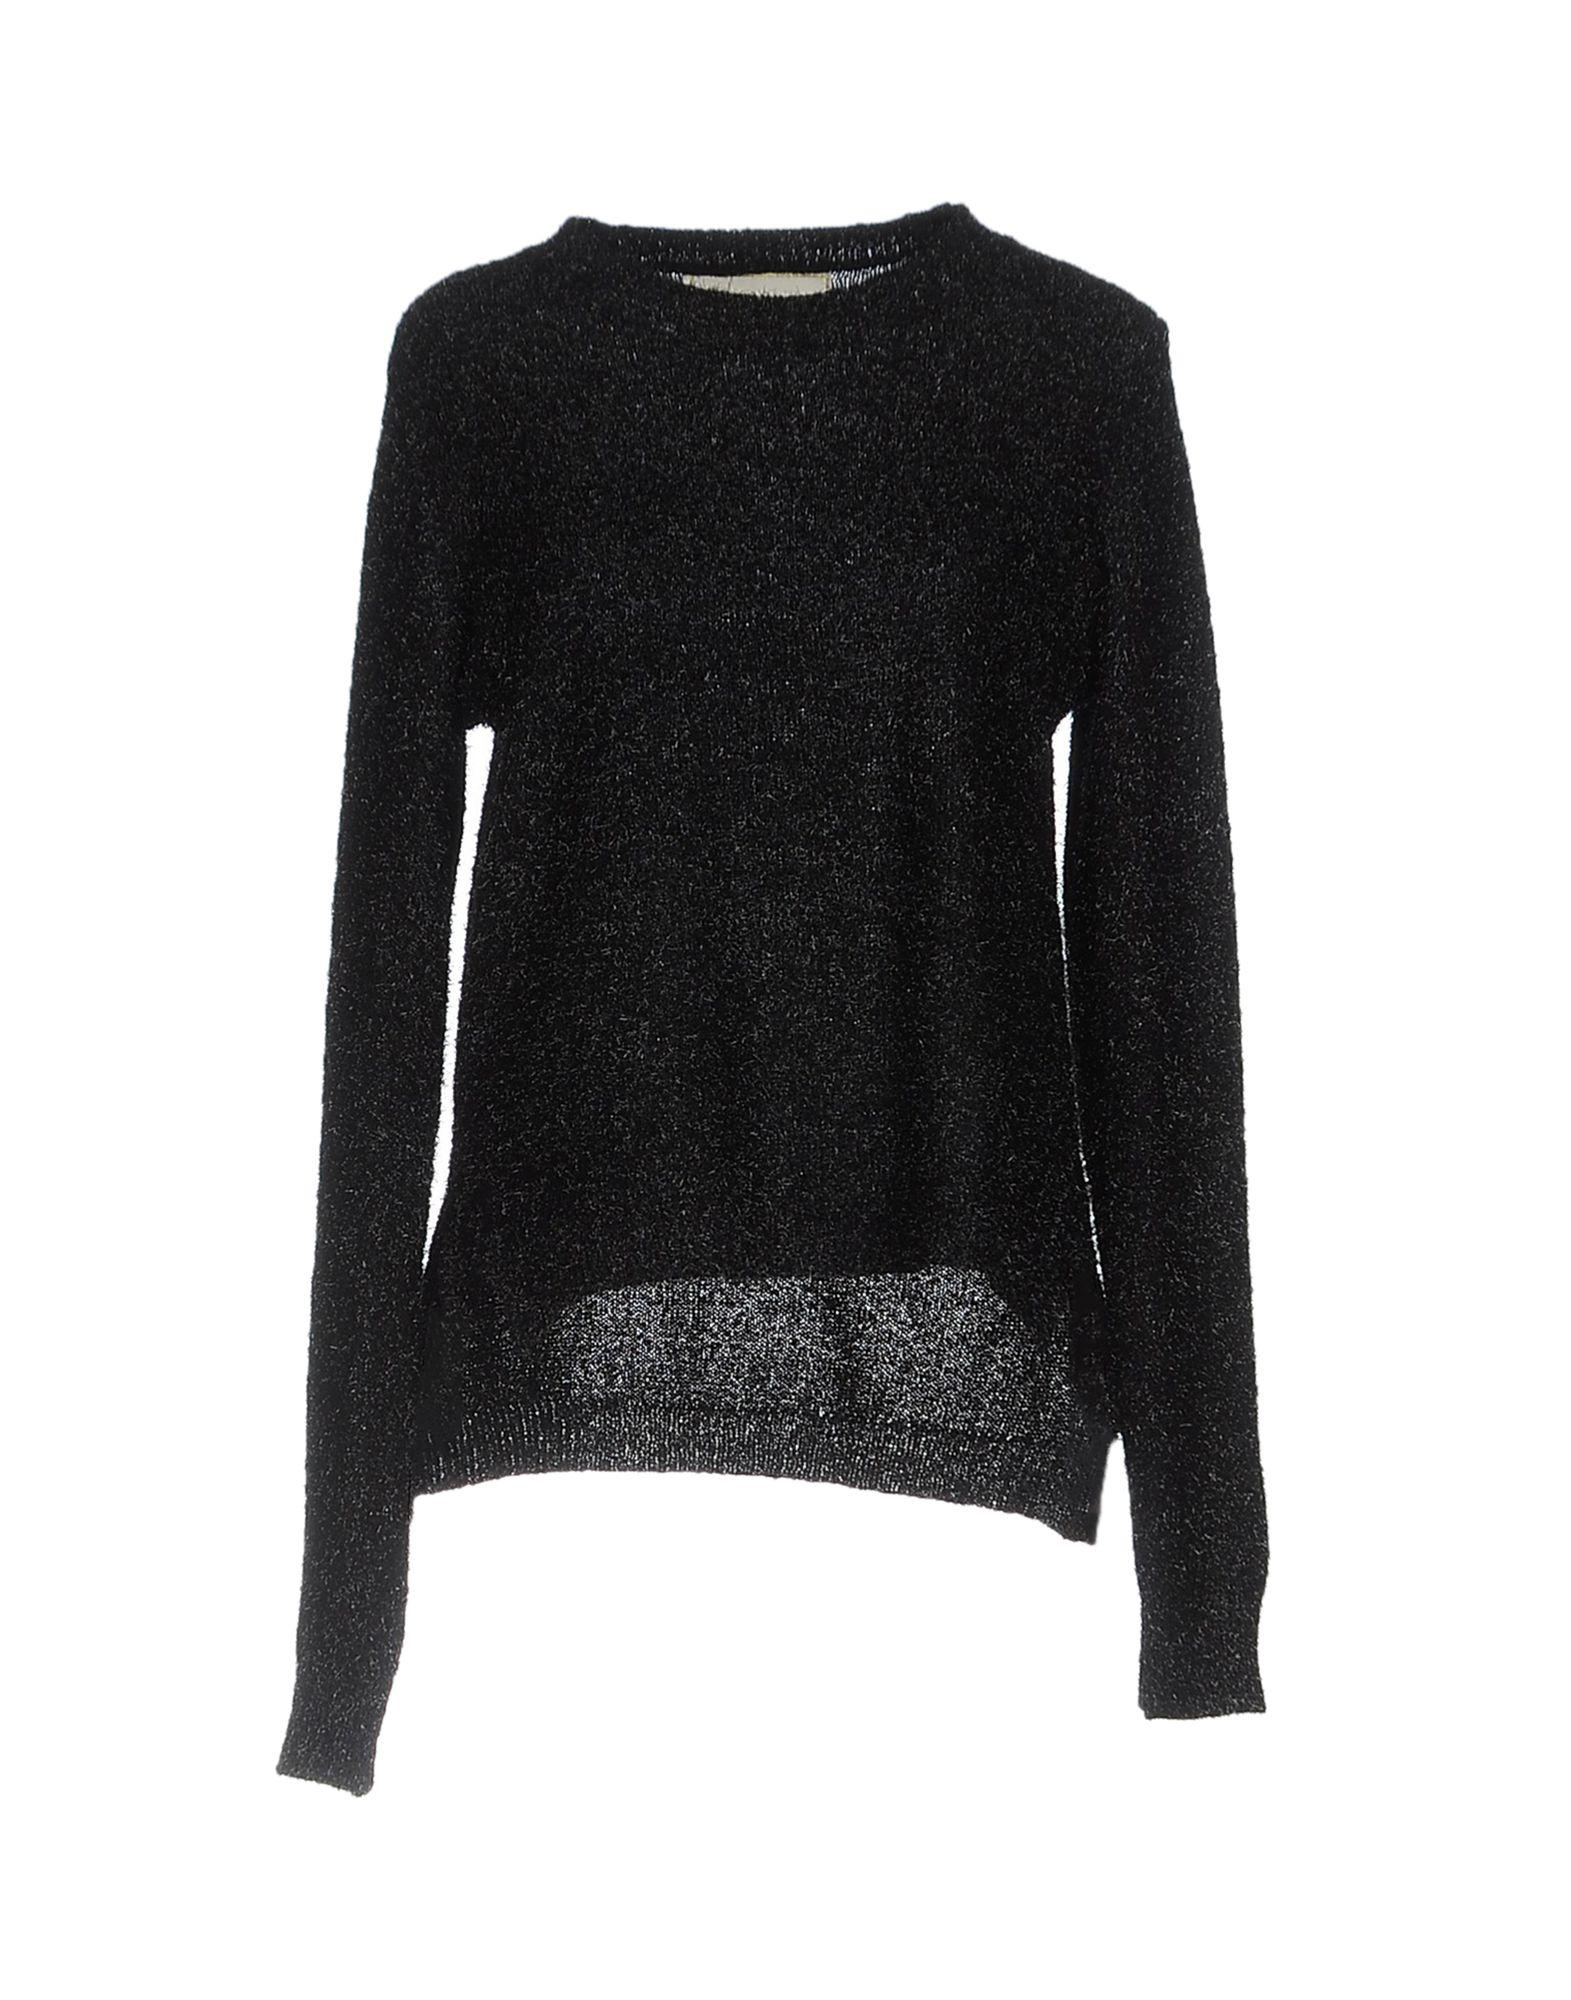 AMUSE Sweater in Black